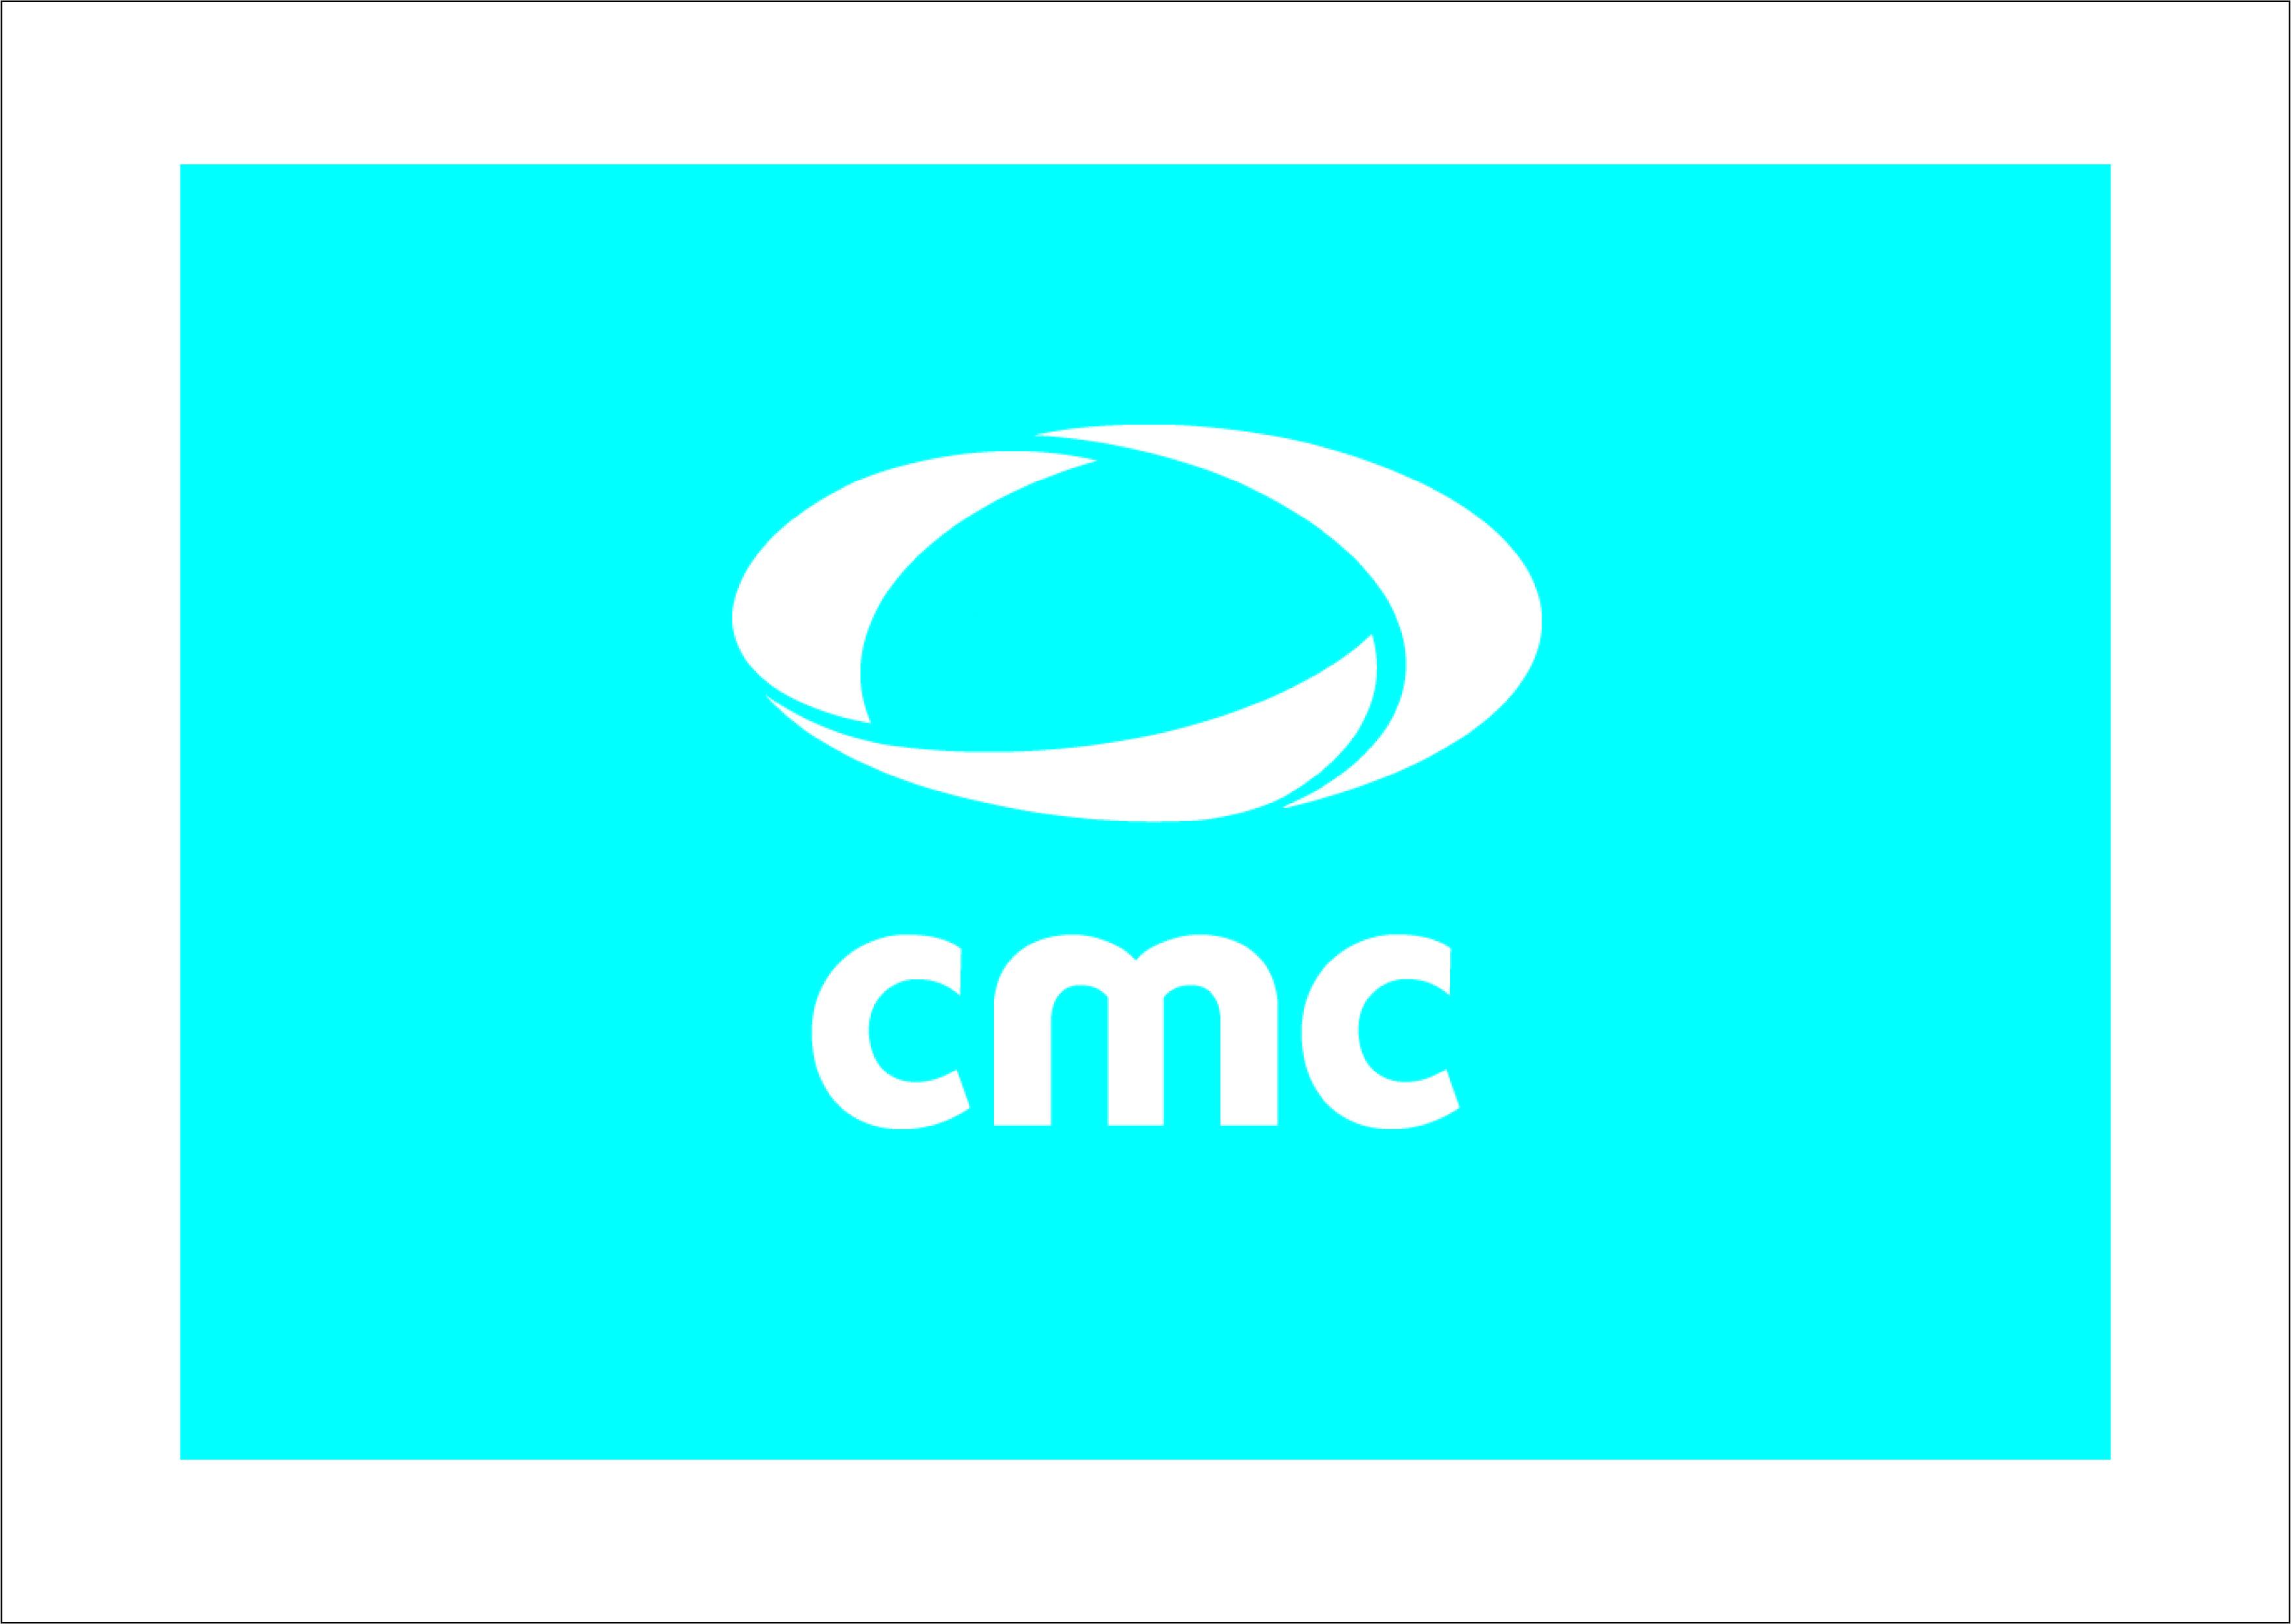 CMC Consumer Medical Care GmbH